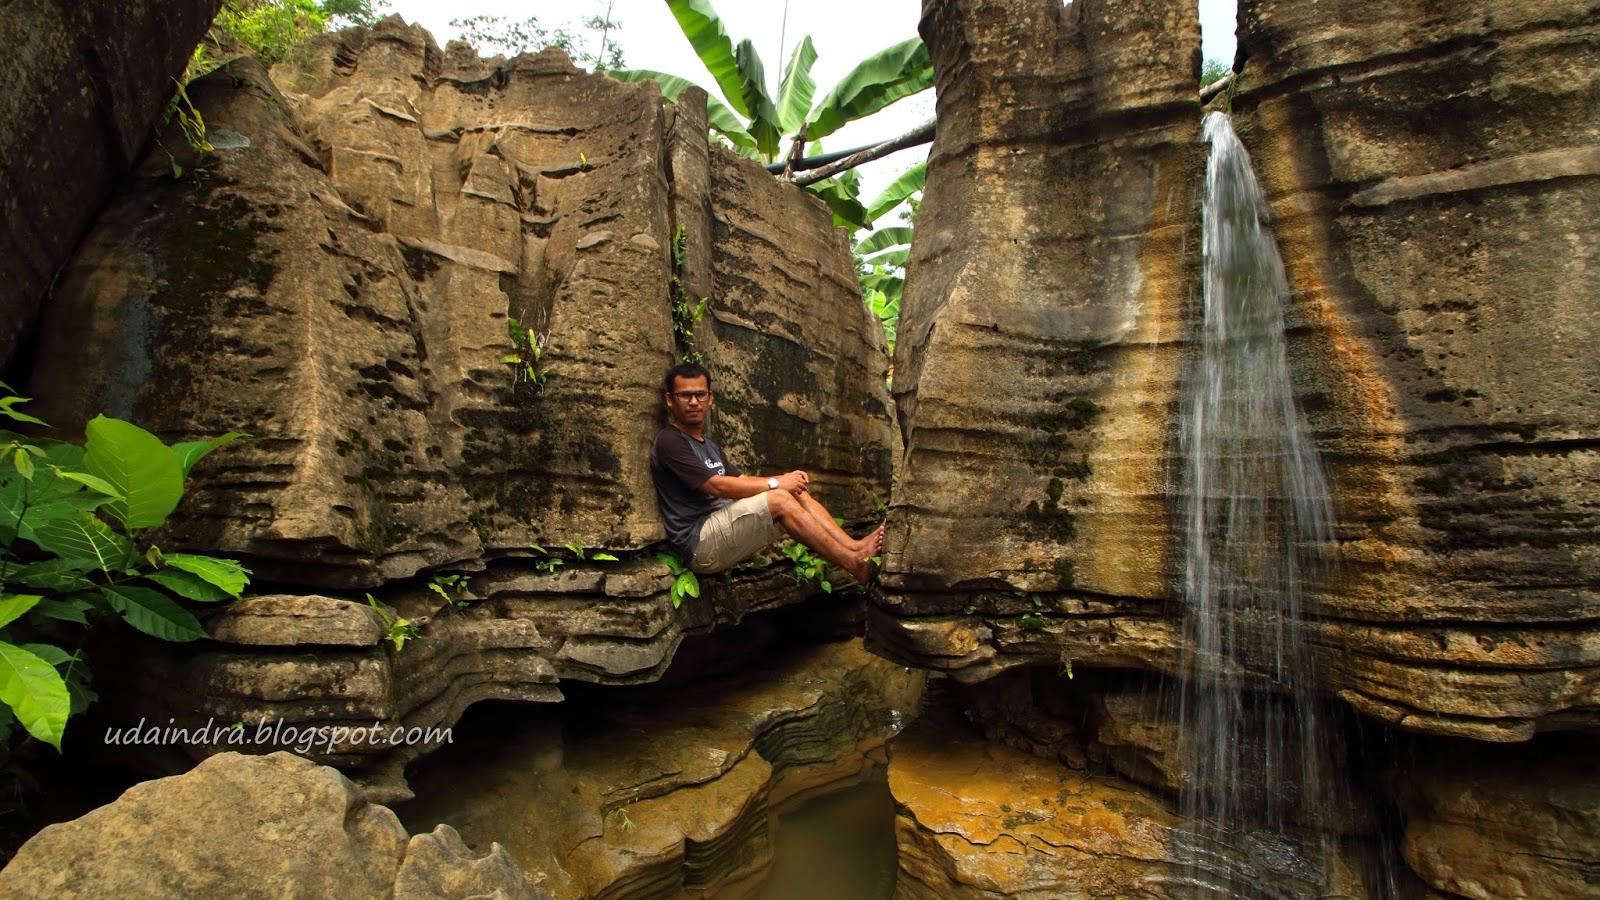 Hiking Ceria Ke Goa Agung Garunggang Geopark Sentul Bogor